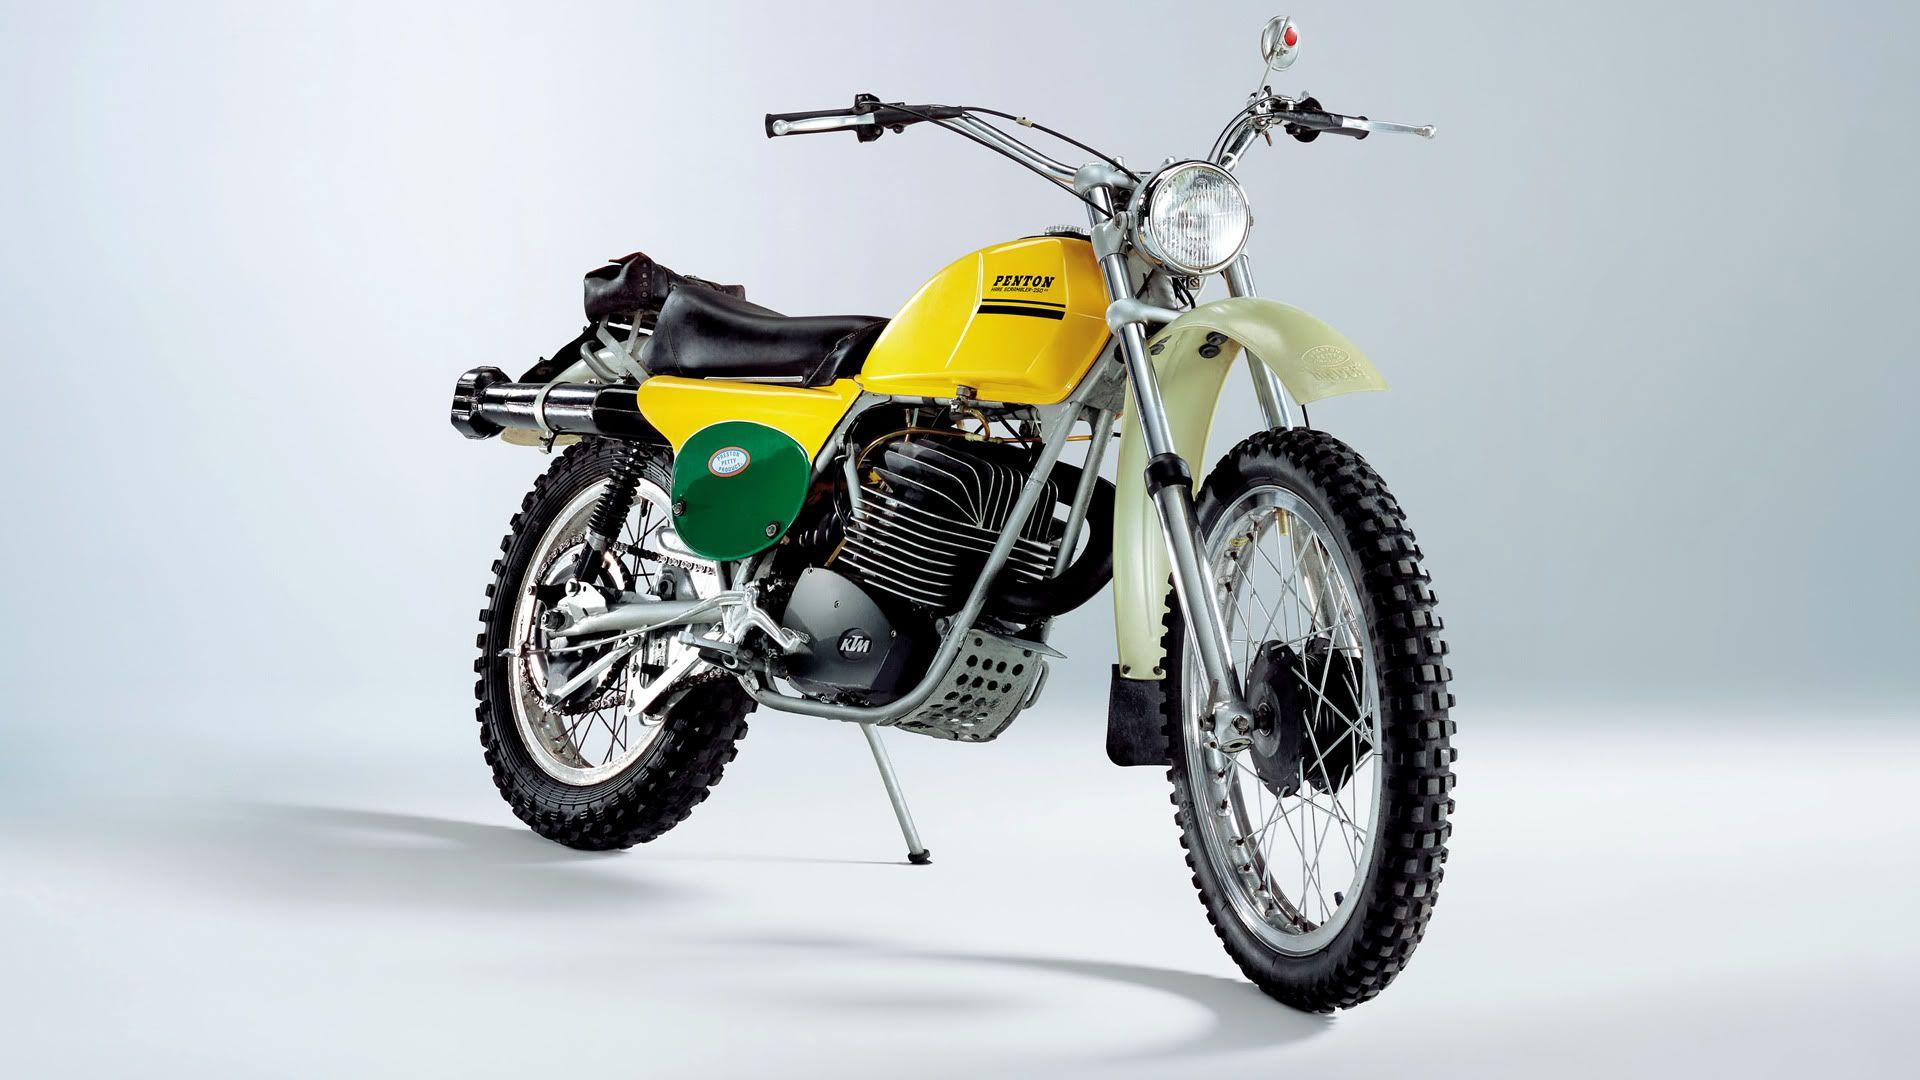 Ktm Penton Ktm Motorcycle Culture Ktm Motorcycles